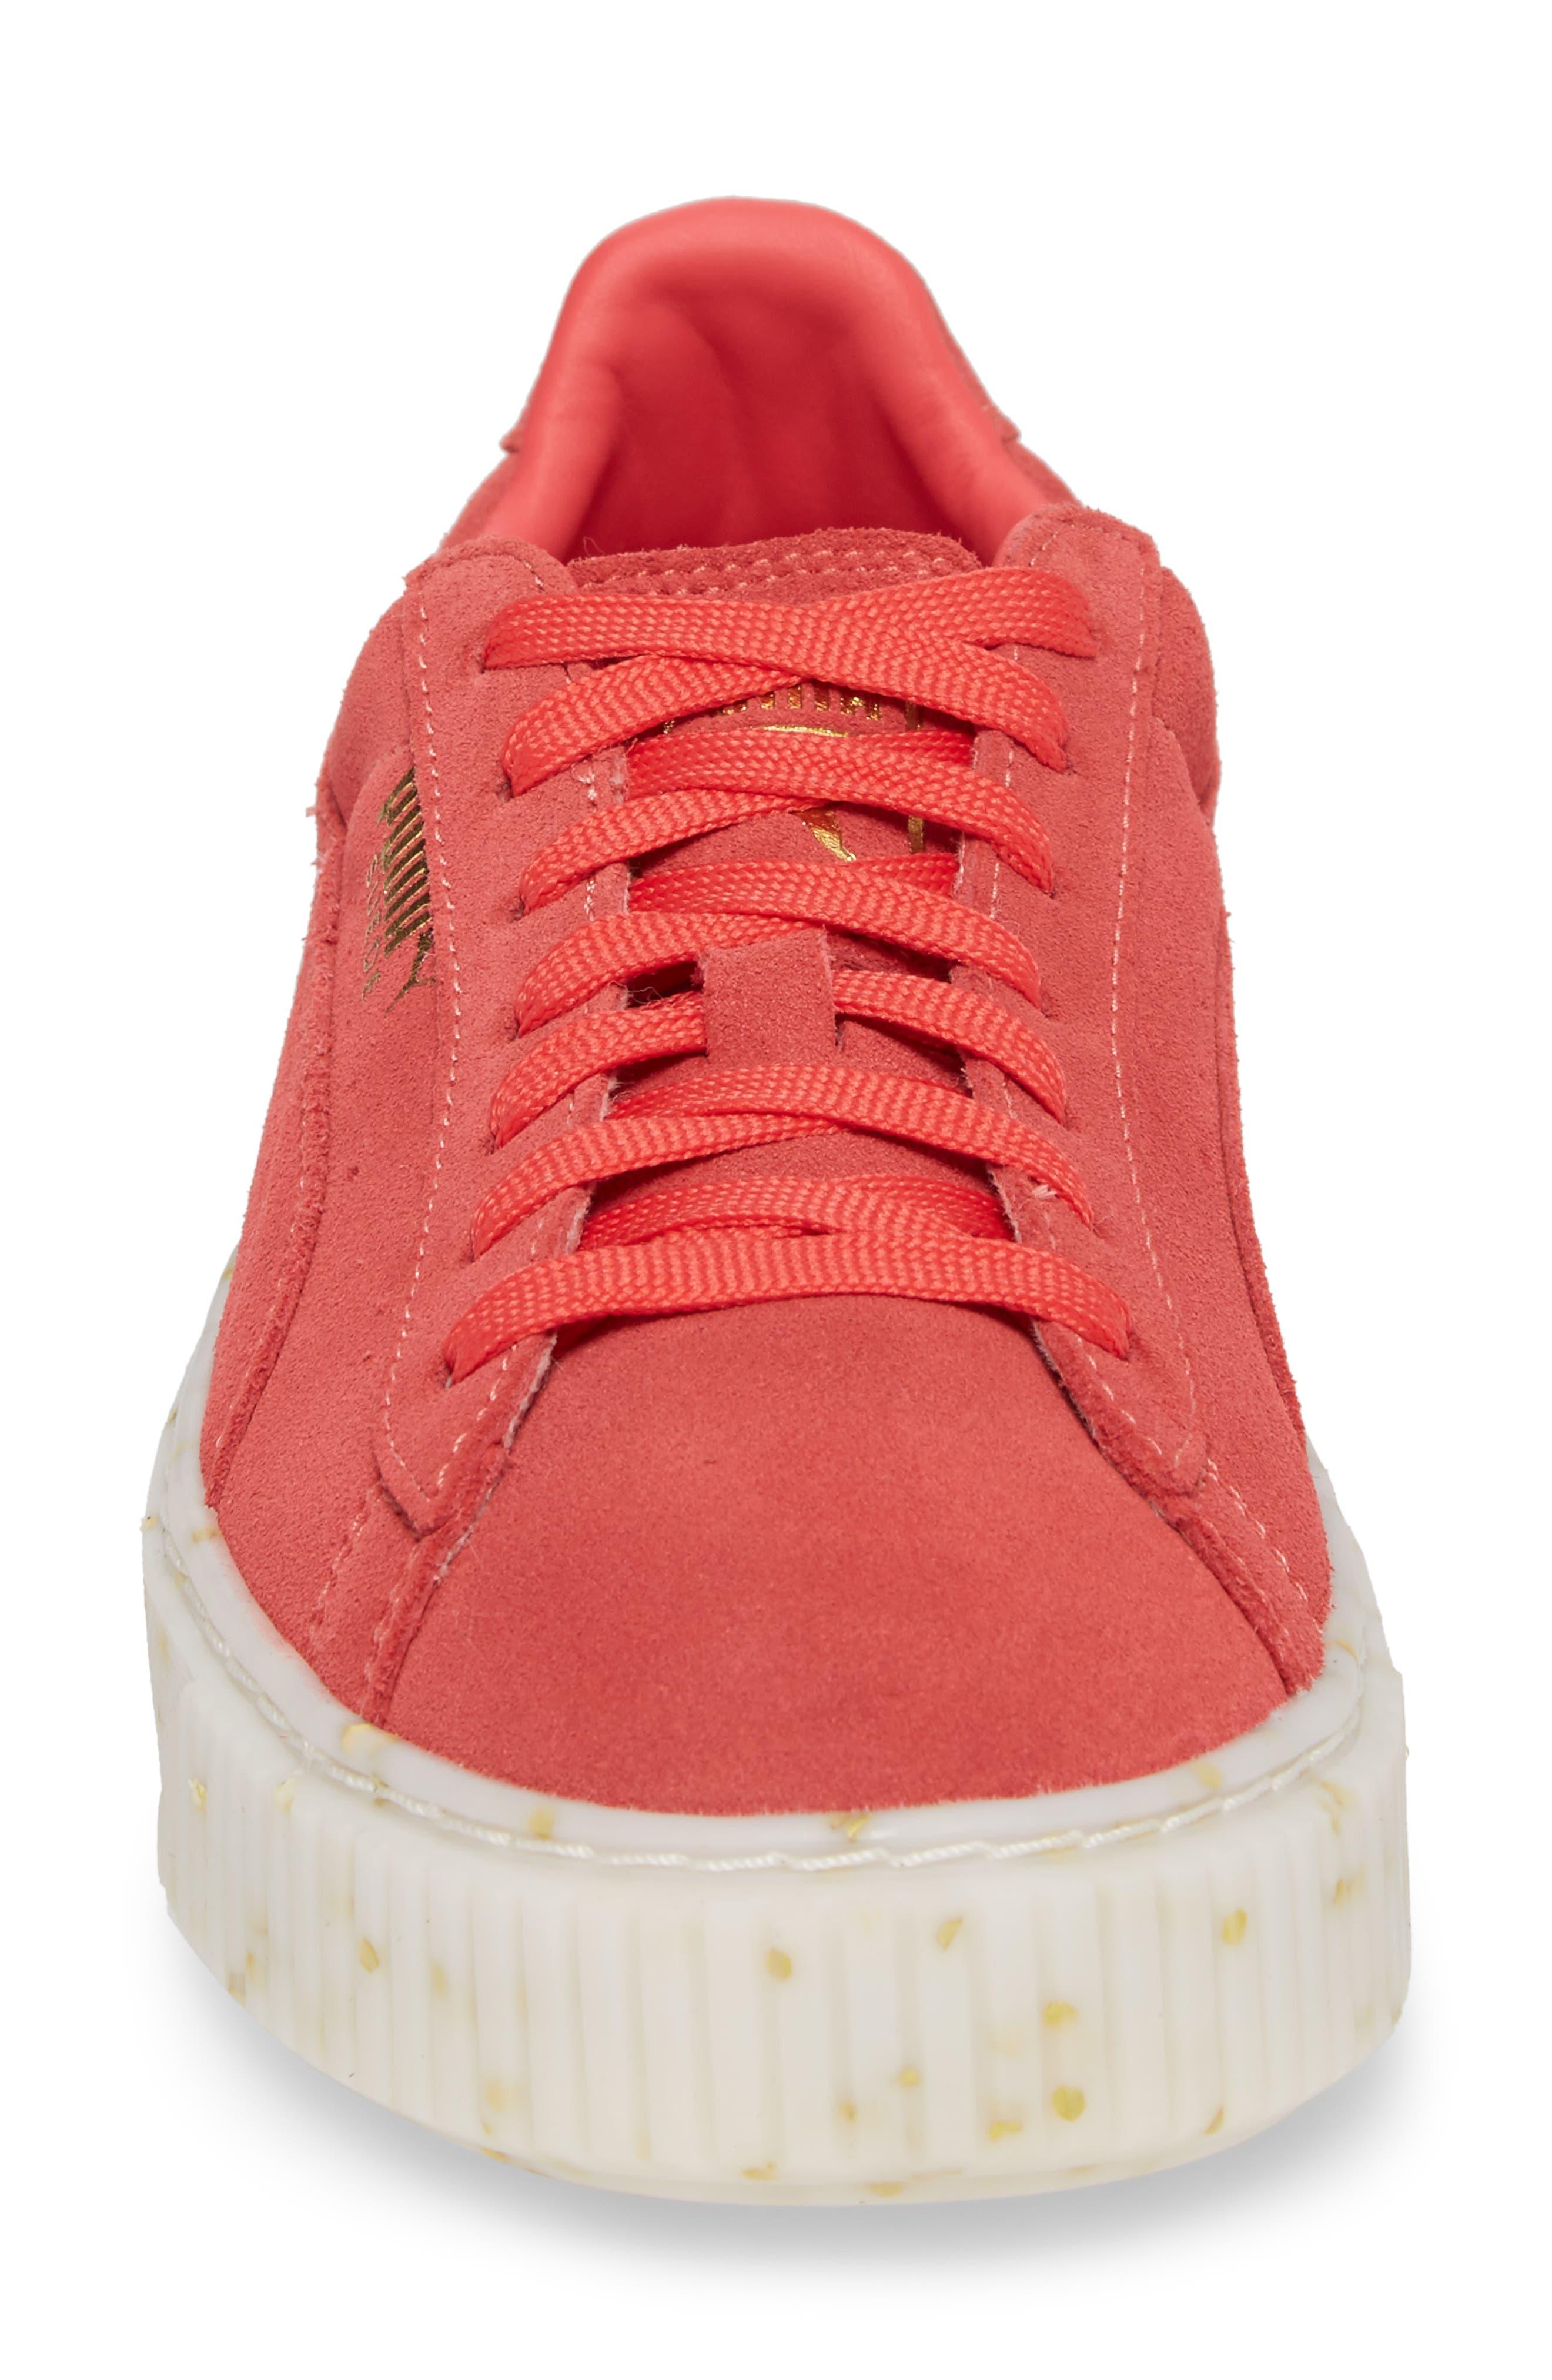 PUMA, Suede Platform Sneaker, Alternate thumbnail 4, color, PARADISE PINK/ TEAM GOLD